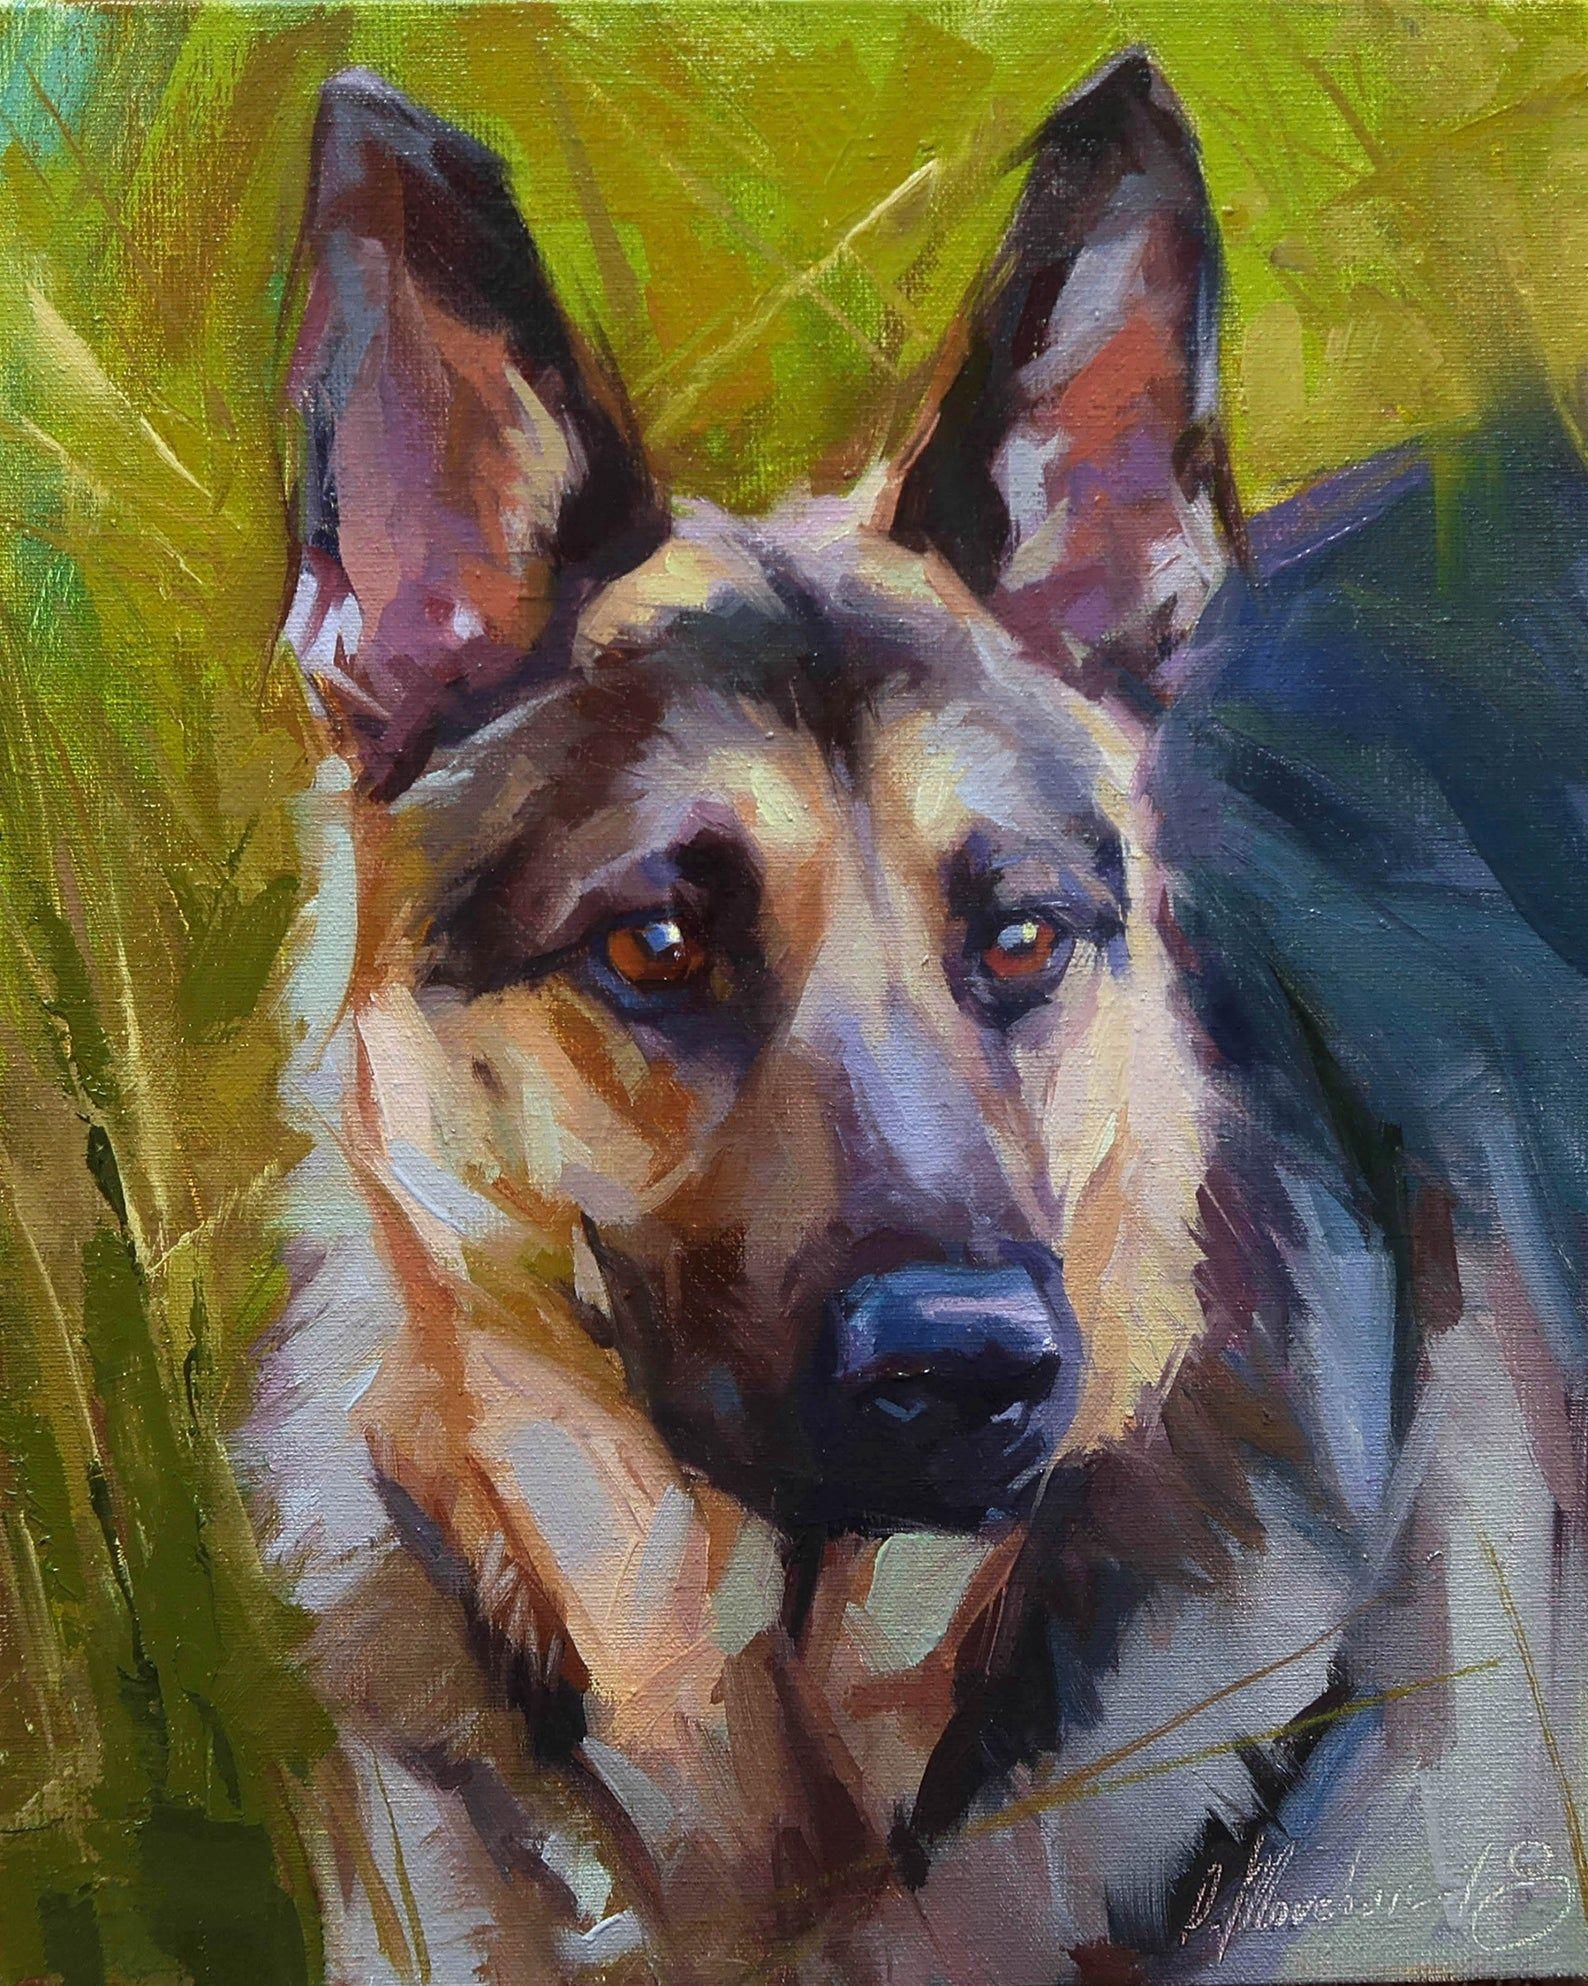 Dog oil portrait, Dog artwork, Costom pet portrait, Pet